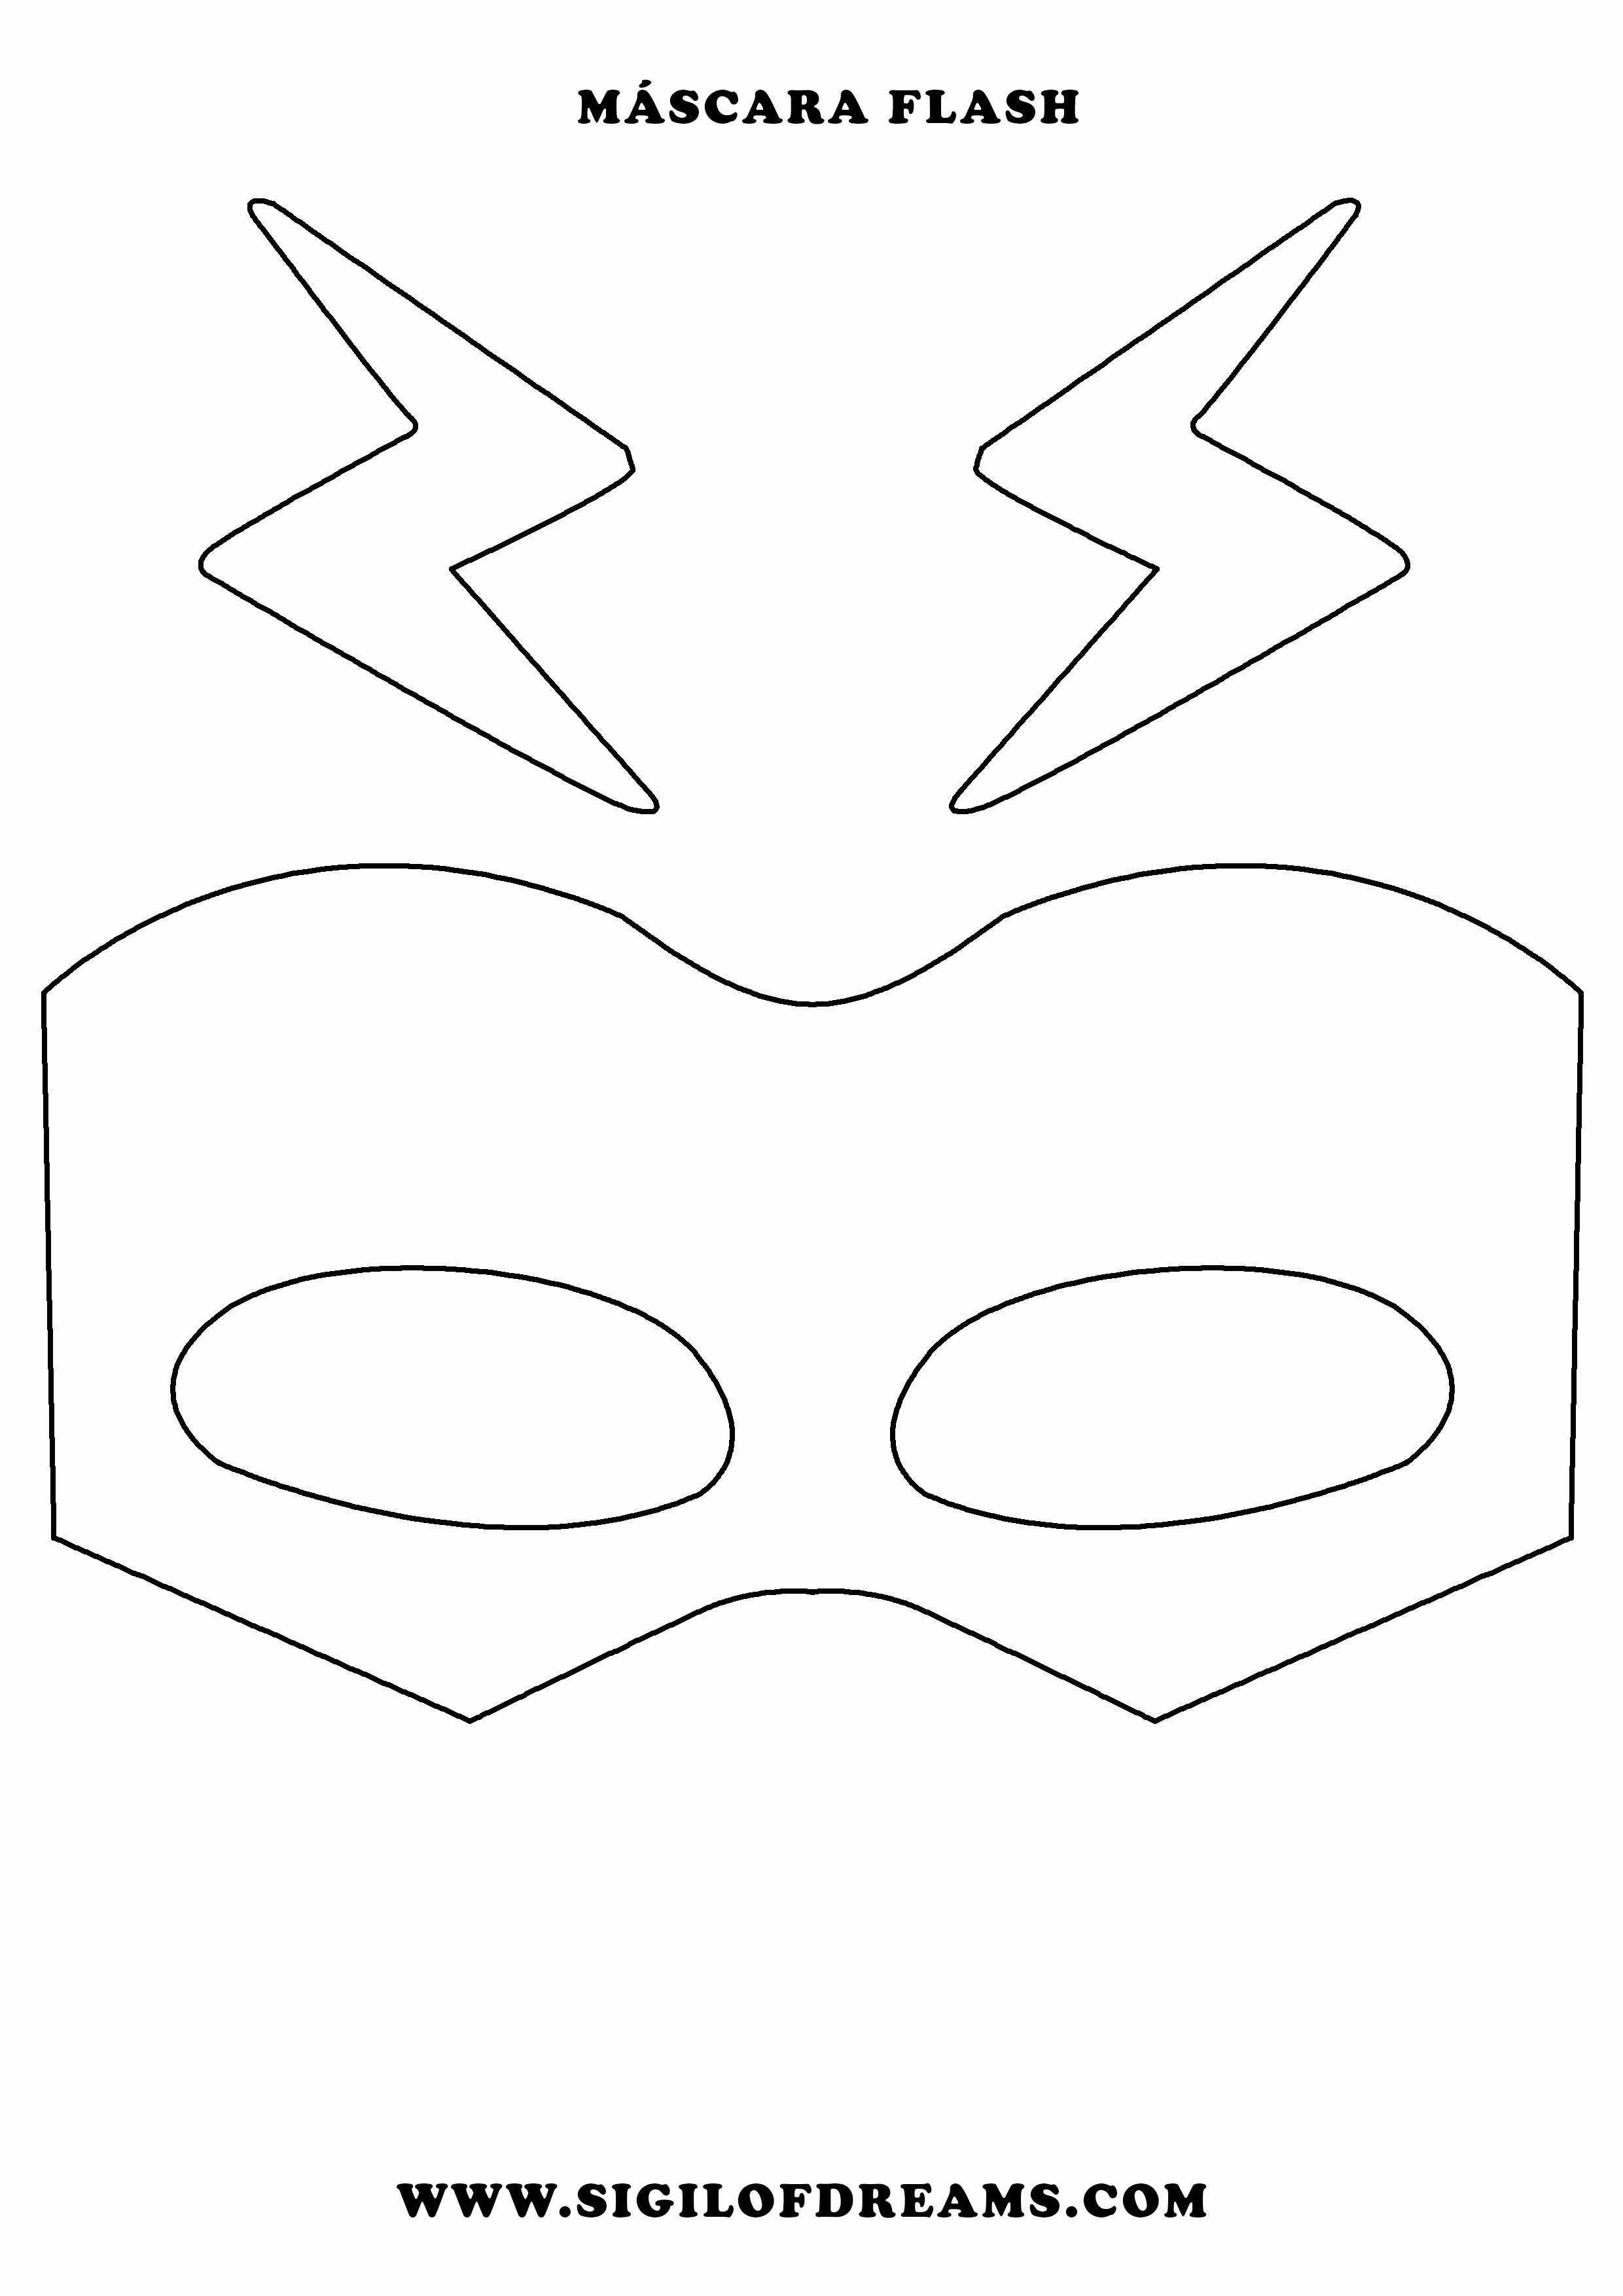 Superhero Mask Template For Kids Unique Mascara De Flash Para